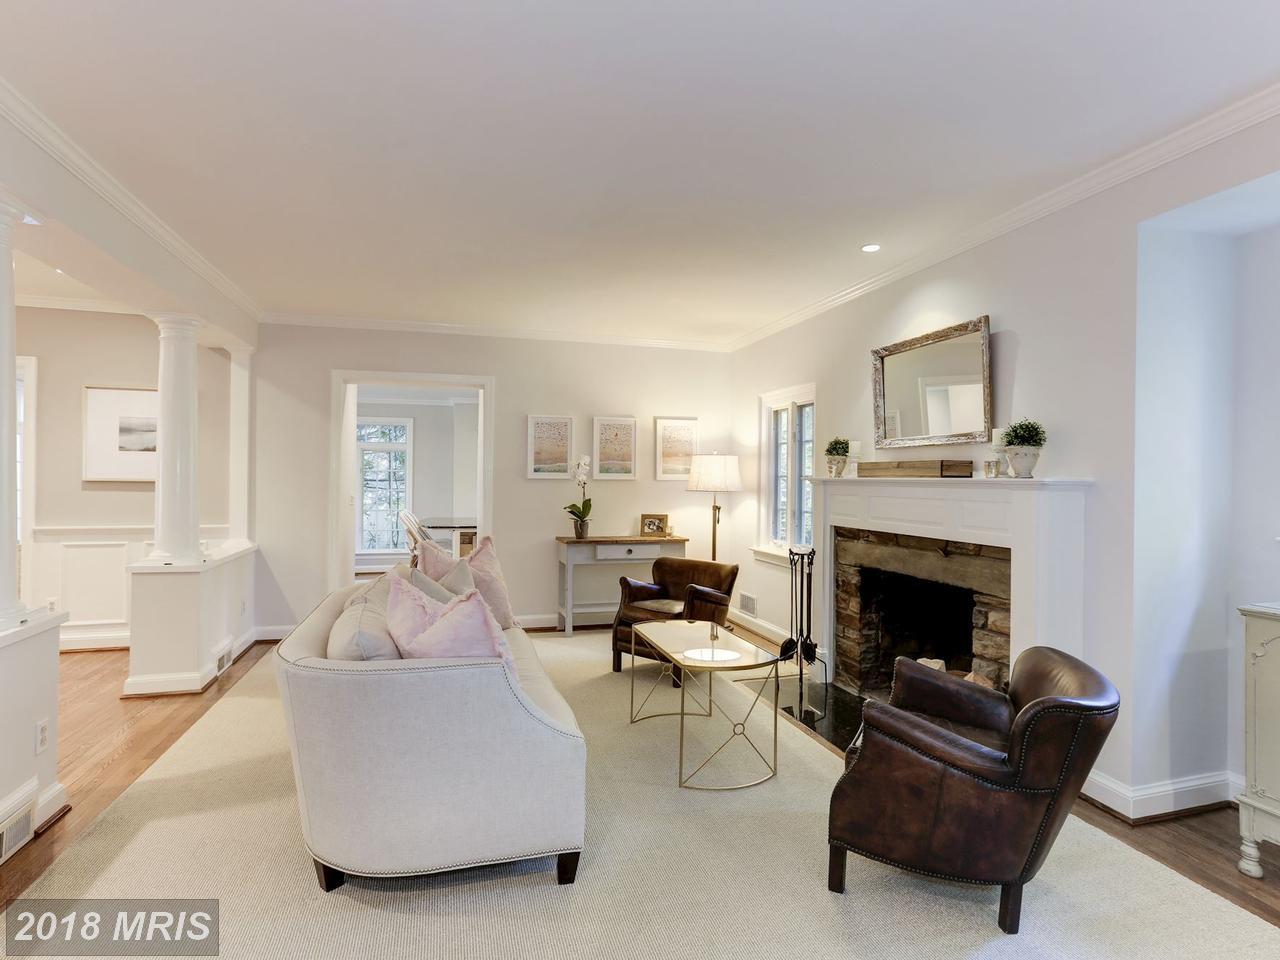 Additional photo for property listing at Tudor, Detached - BETHESDA, MD 8012 HAMPDEN LN Bethesda, Maryland,20814 United States